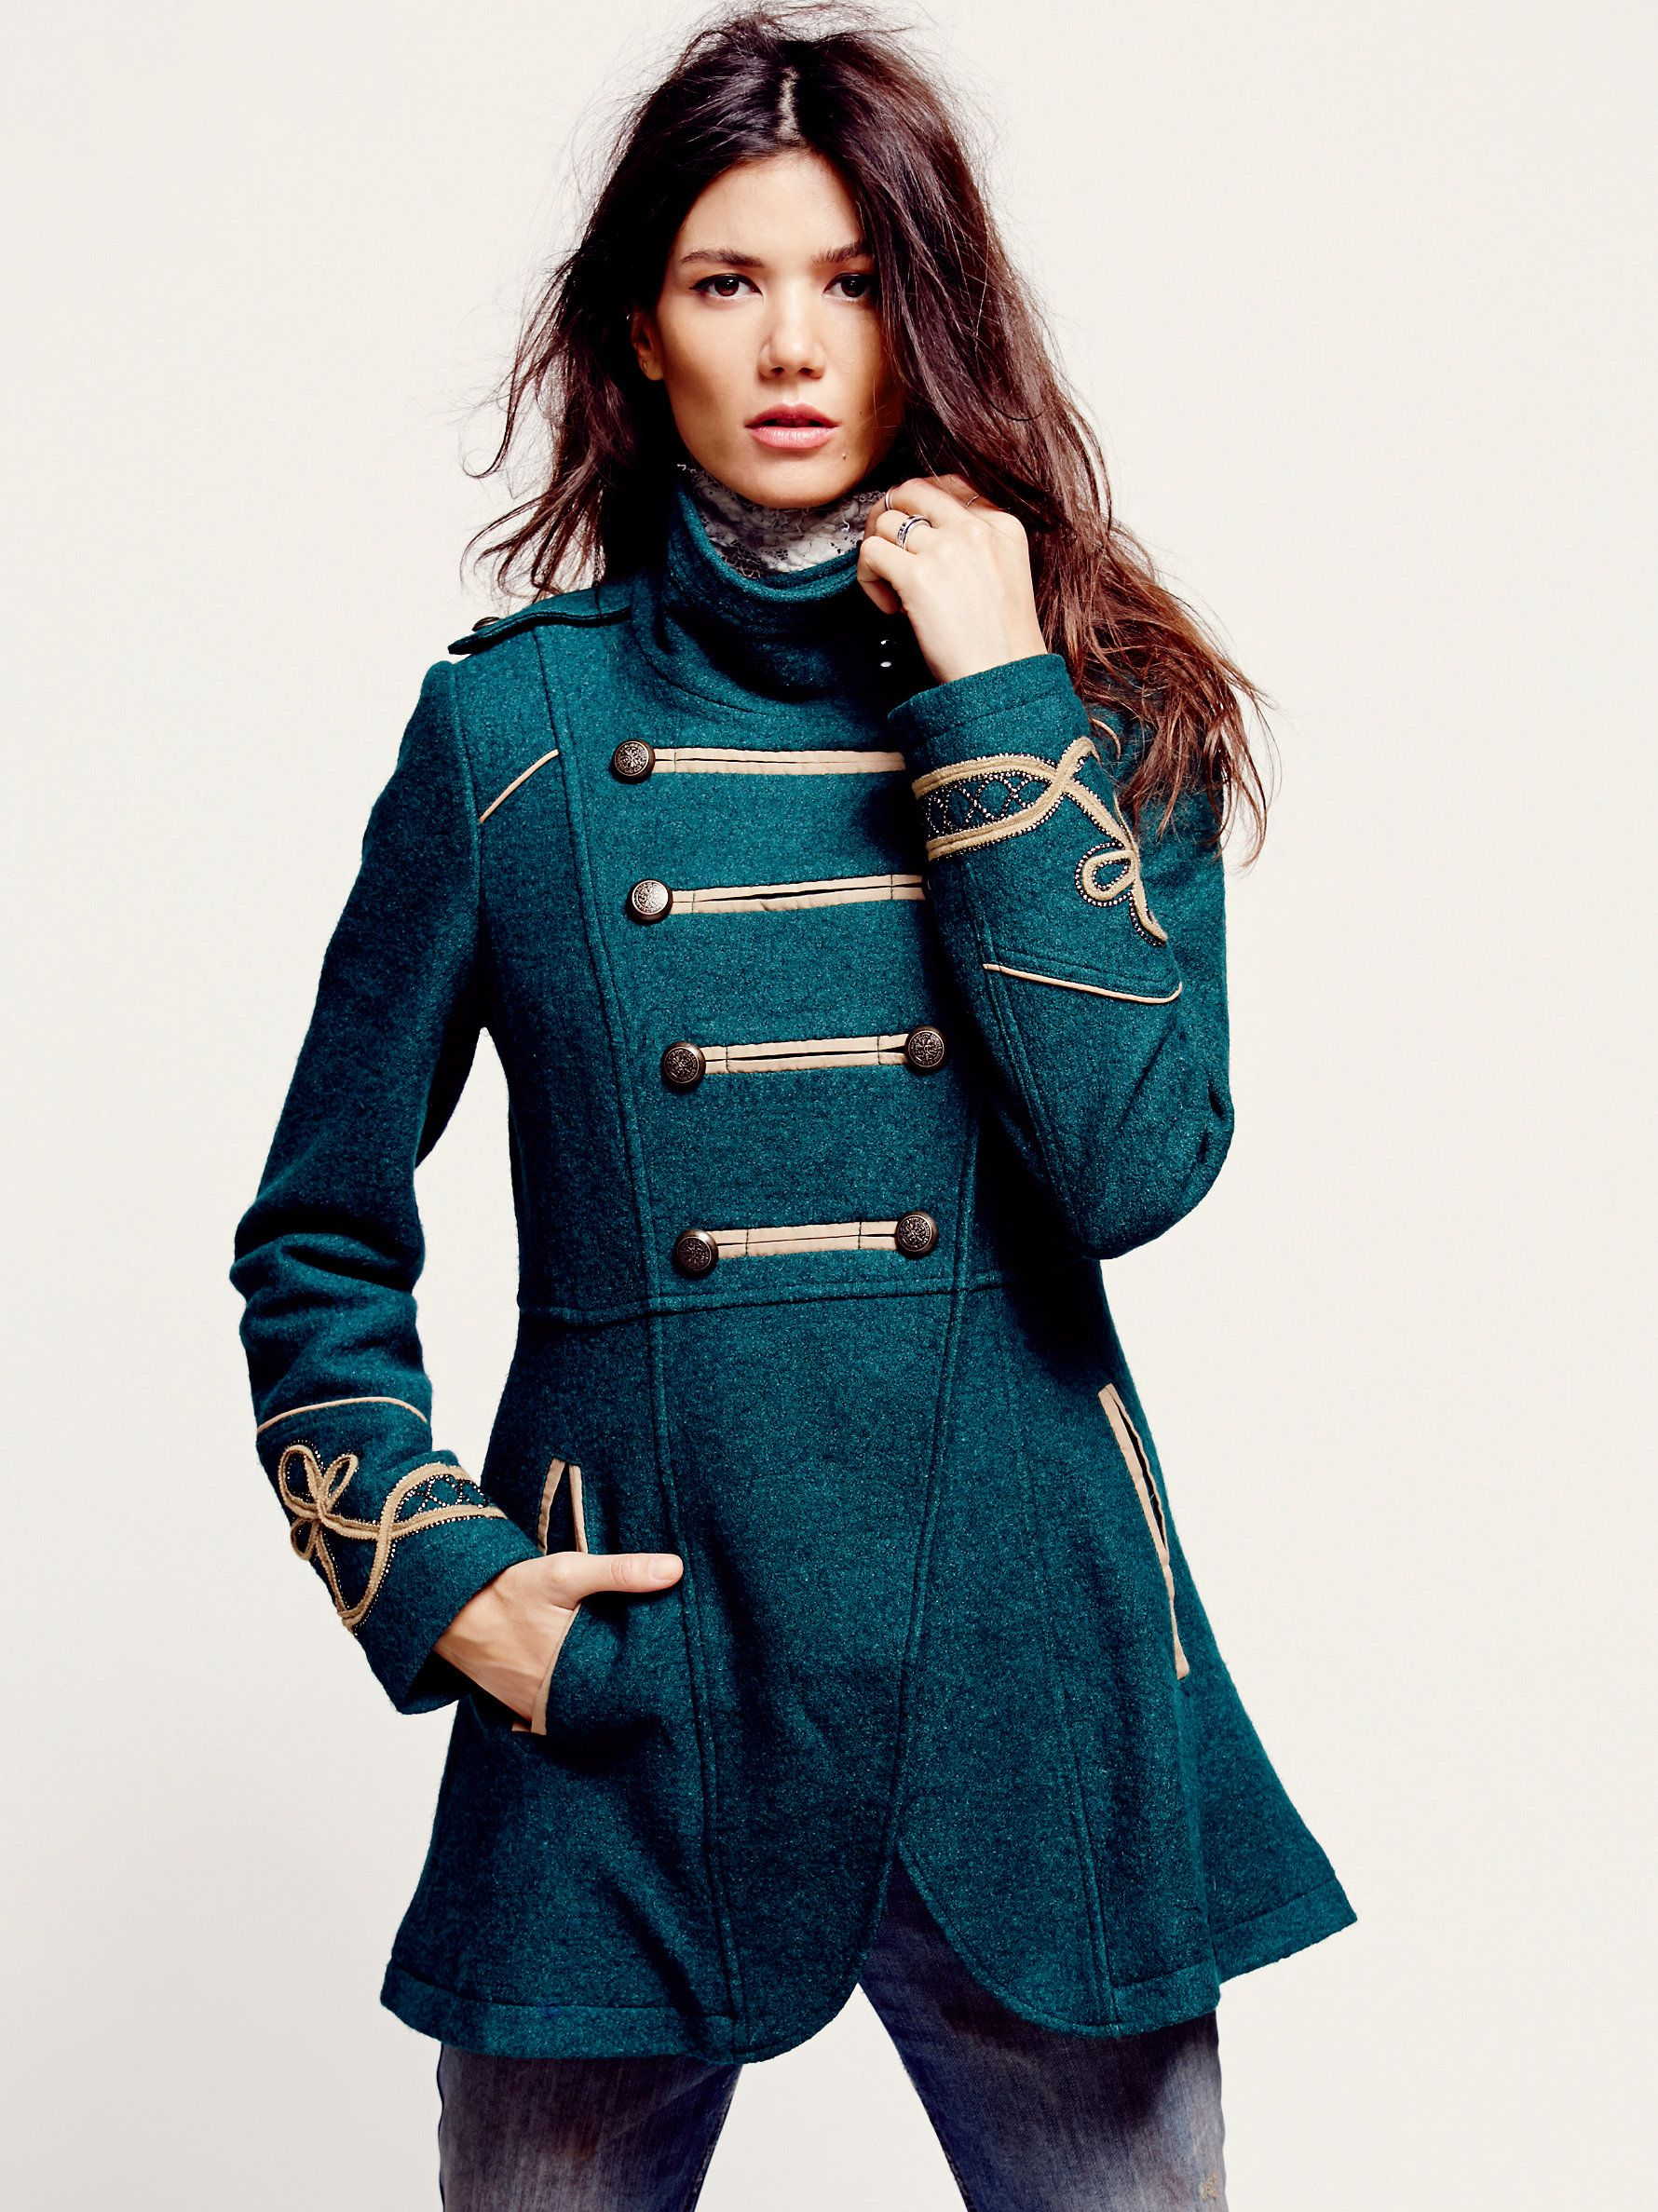 Free People Military Wool Coat Military Inspired Fashion Military Fashion Fashion [ 2375 x 1780 Pixel ]